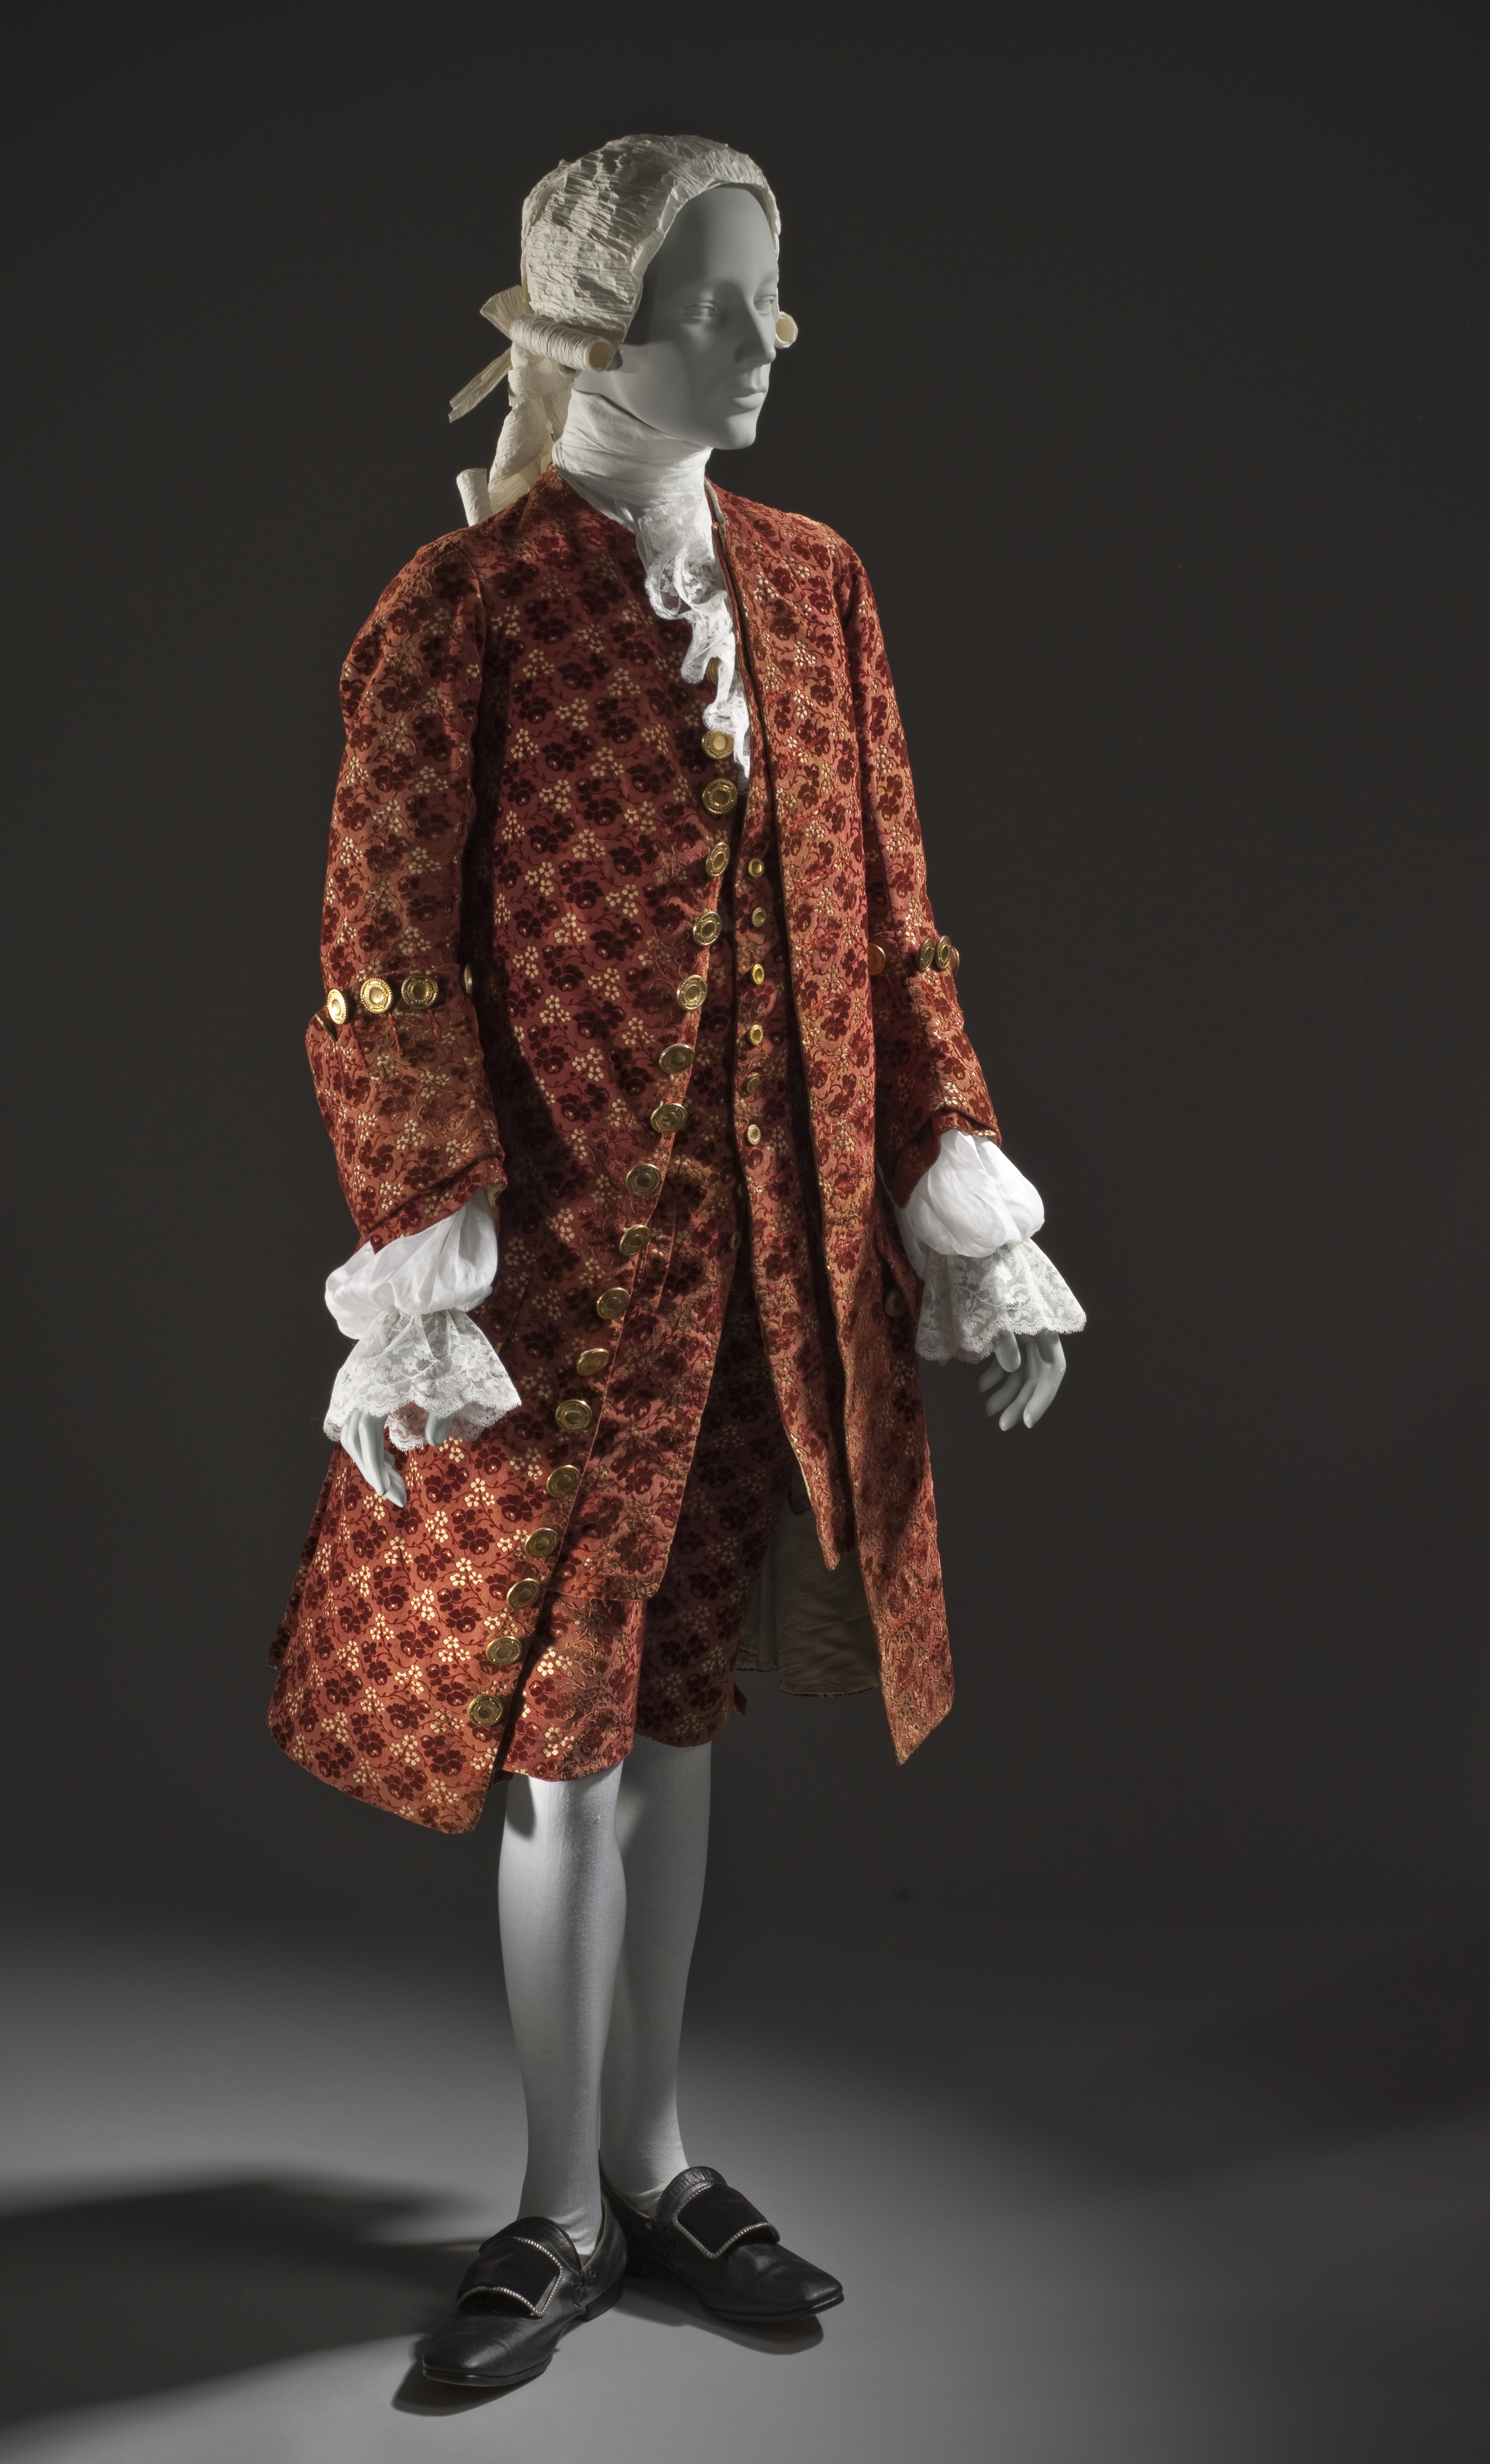 Frock coat - Wikipedia